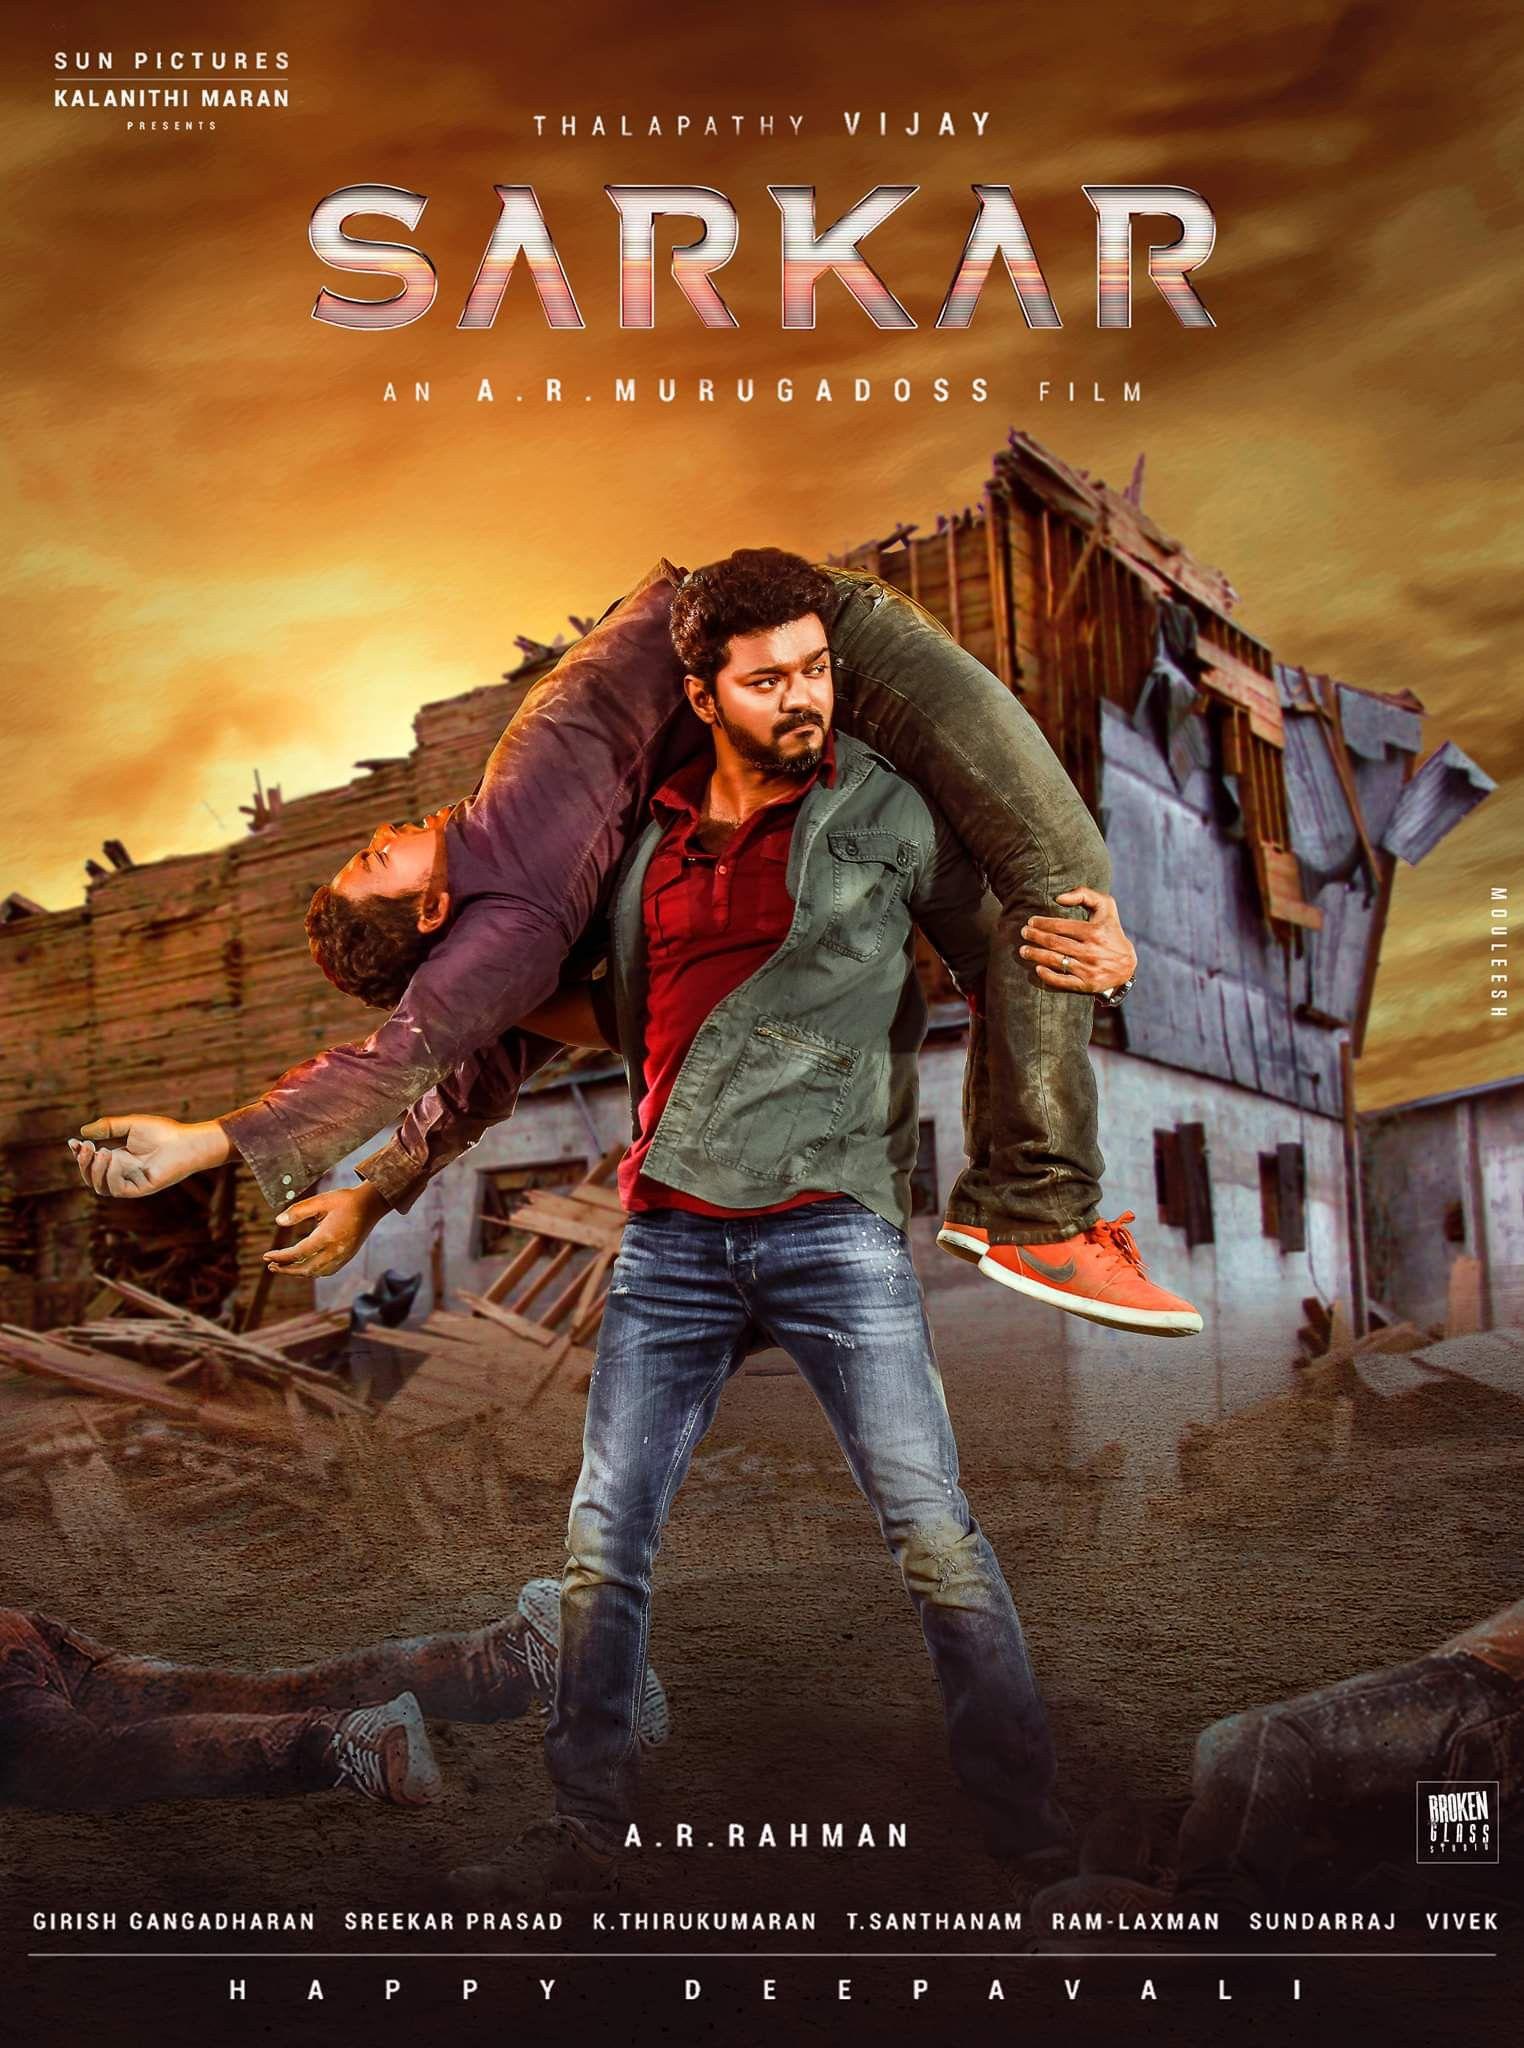 Sarkar 2018 HQ Hindi Dubbed 480p HDRip ESub 500MB Download